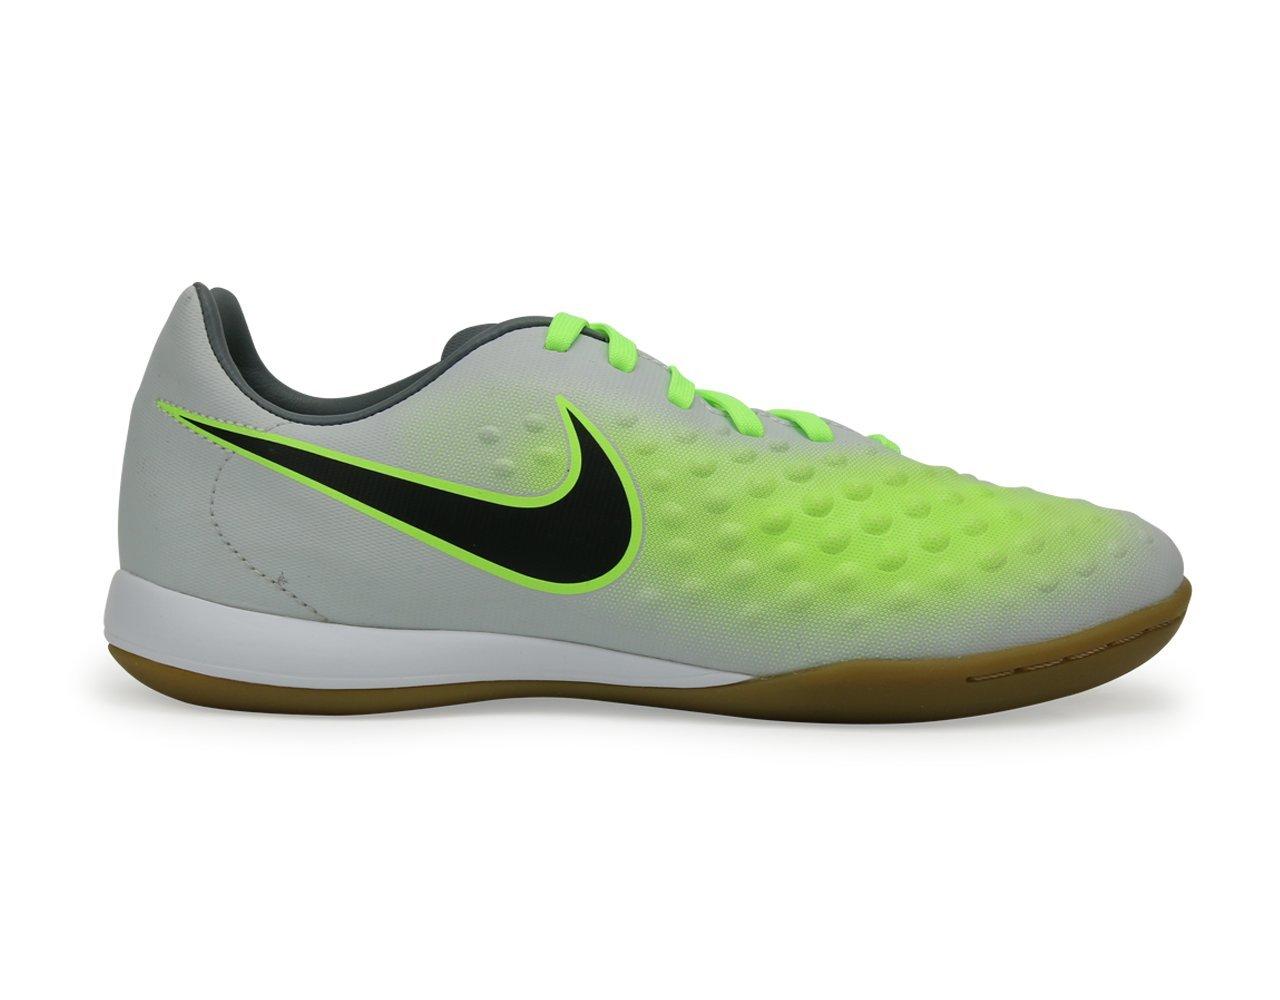 Nike Kids MagistaX Opus Indoor Pure Platinum/Black/Ghost Green Shoes - 11C